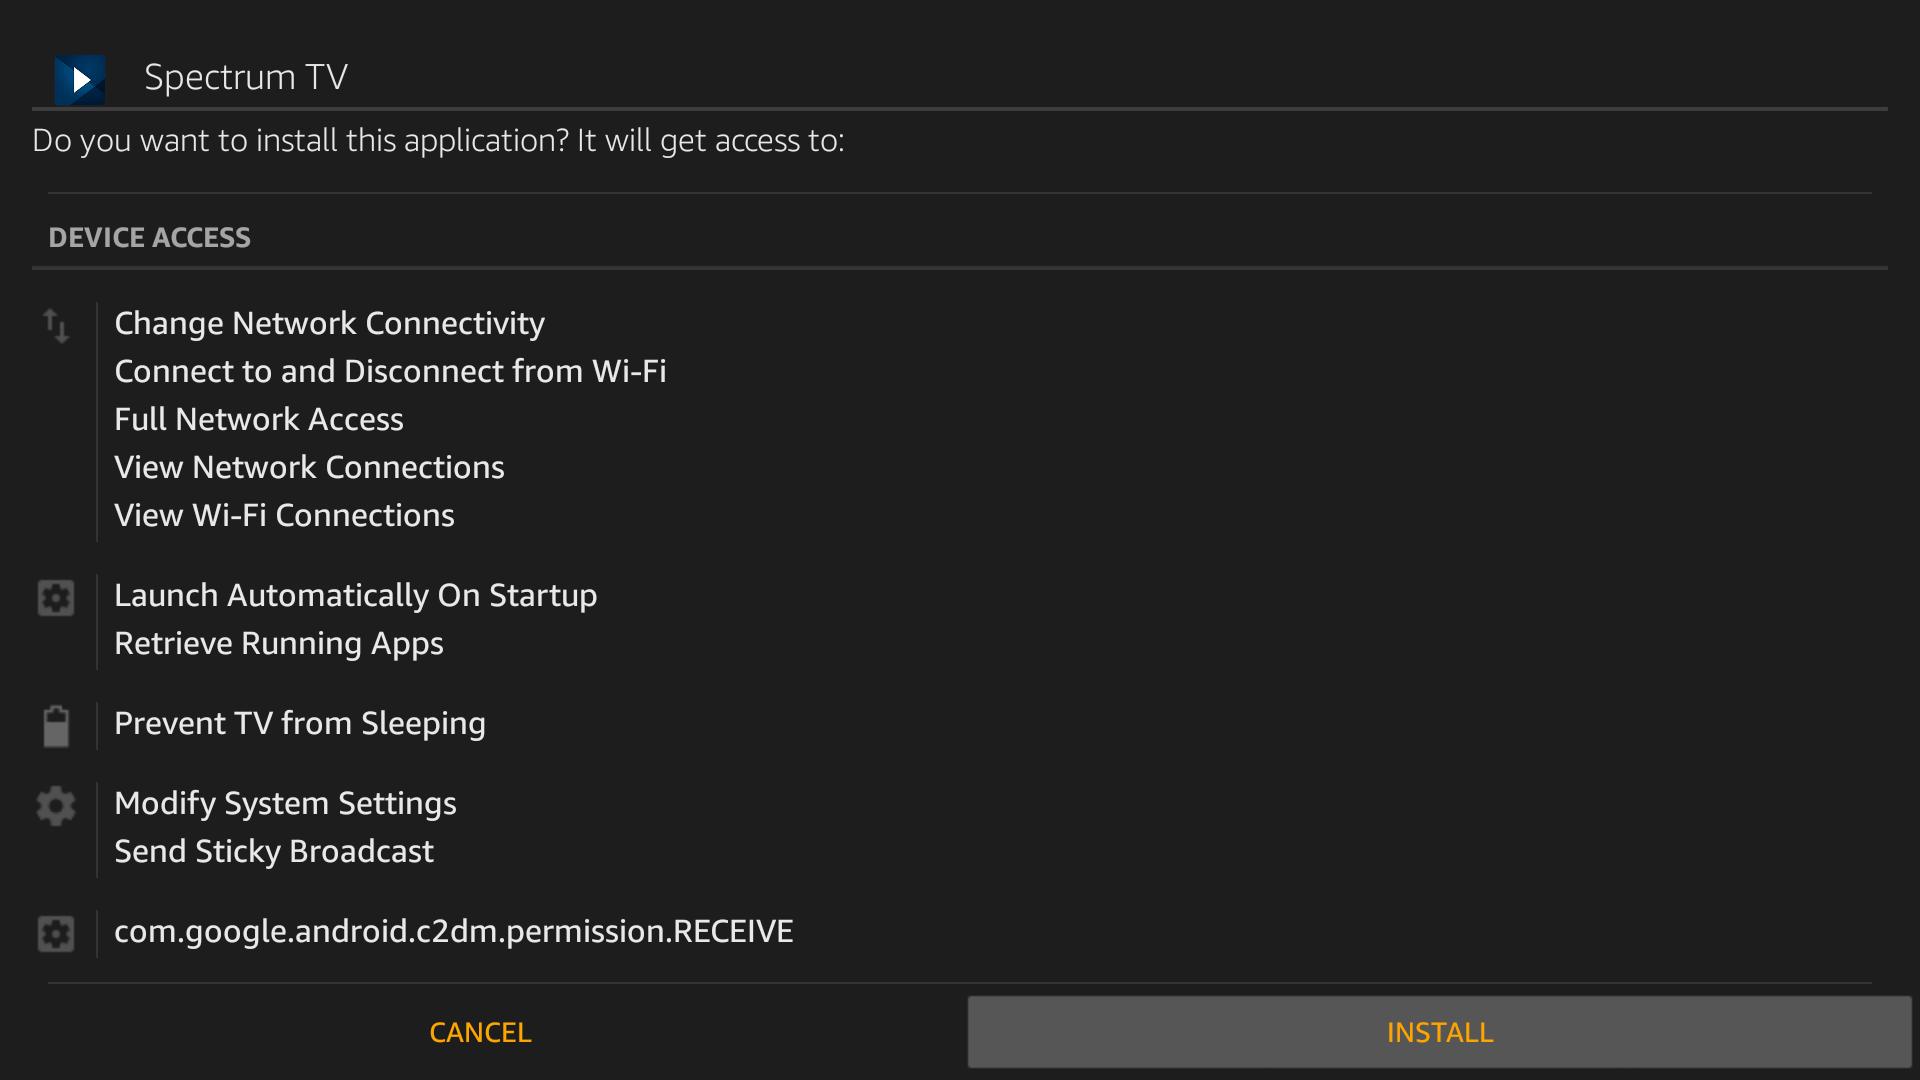 Spectrum-TV-App-using Downloader-4